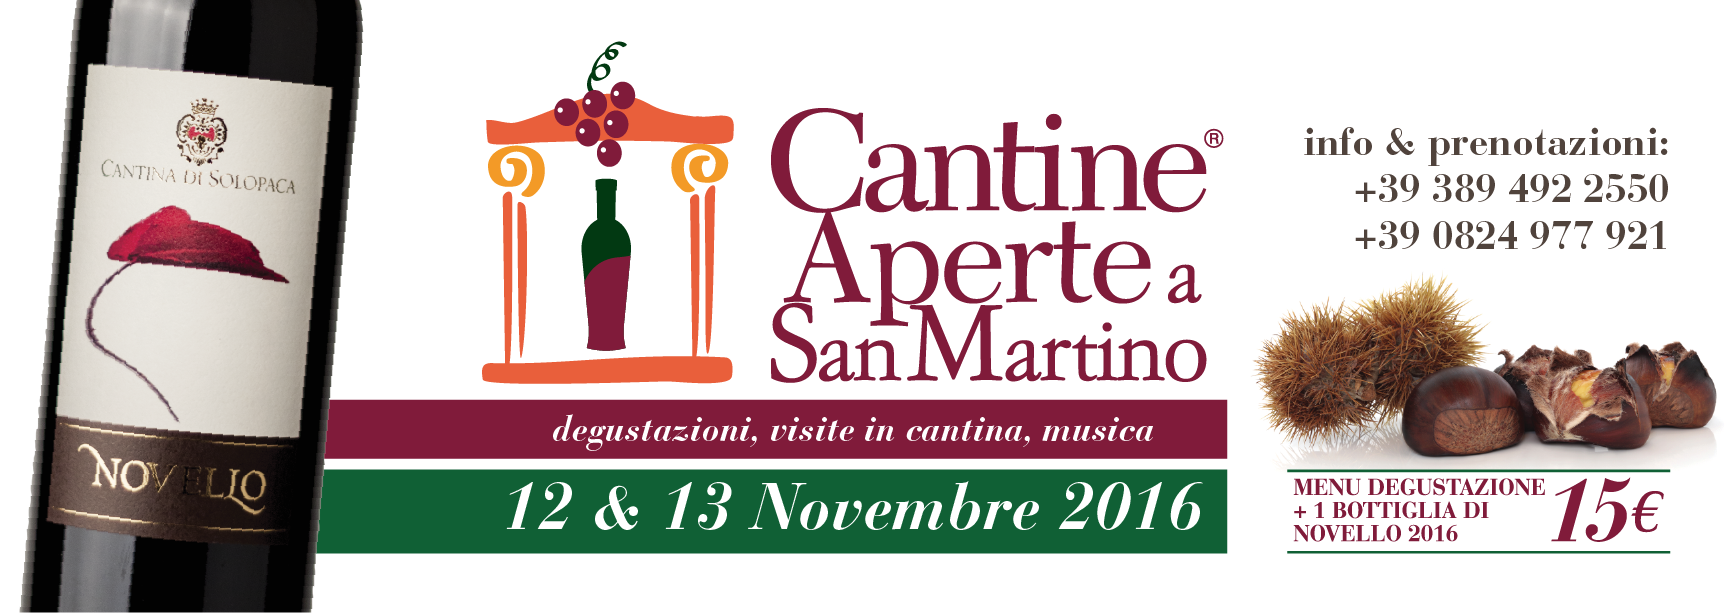 Cantine Aperte a San Martino 12 e 13 Novembre 2016